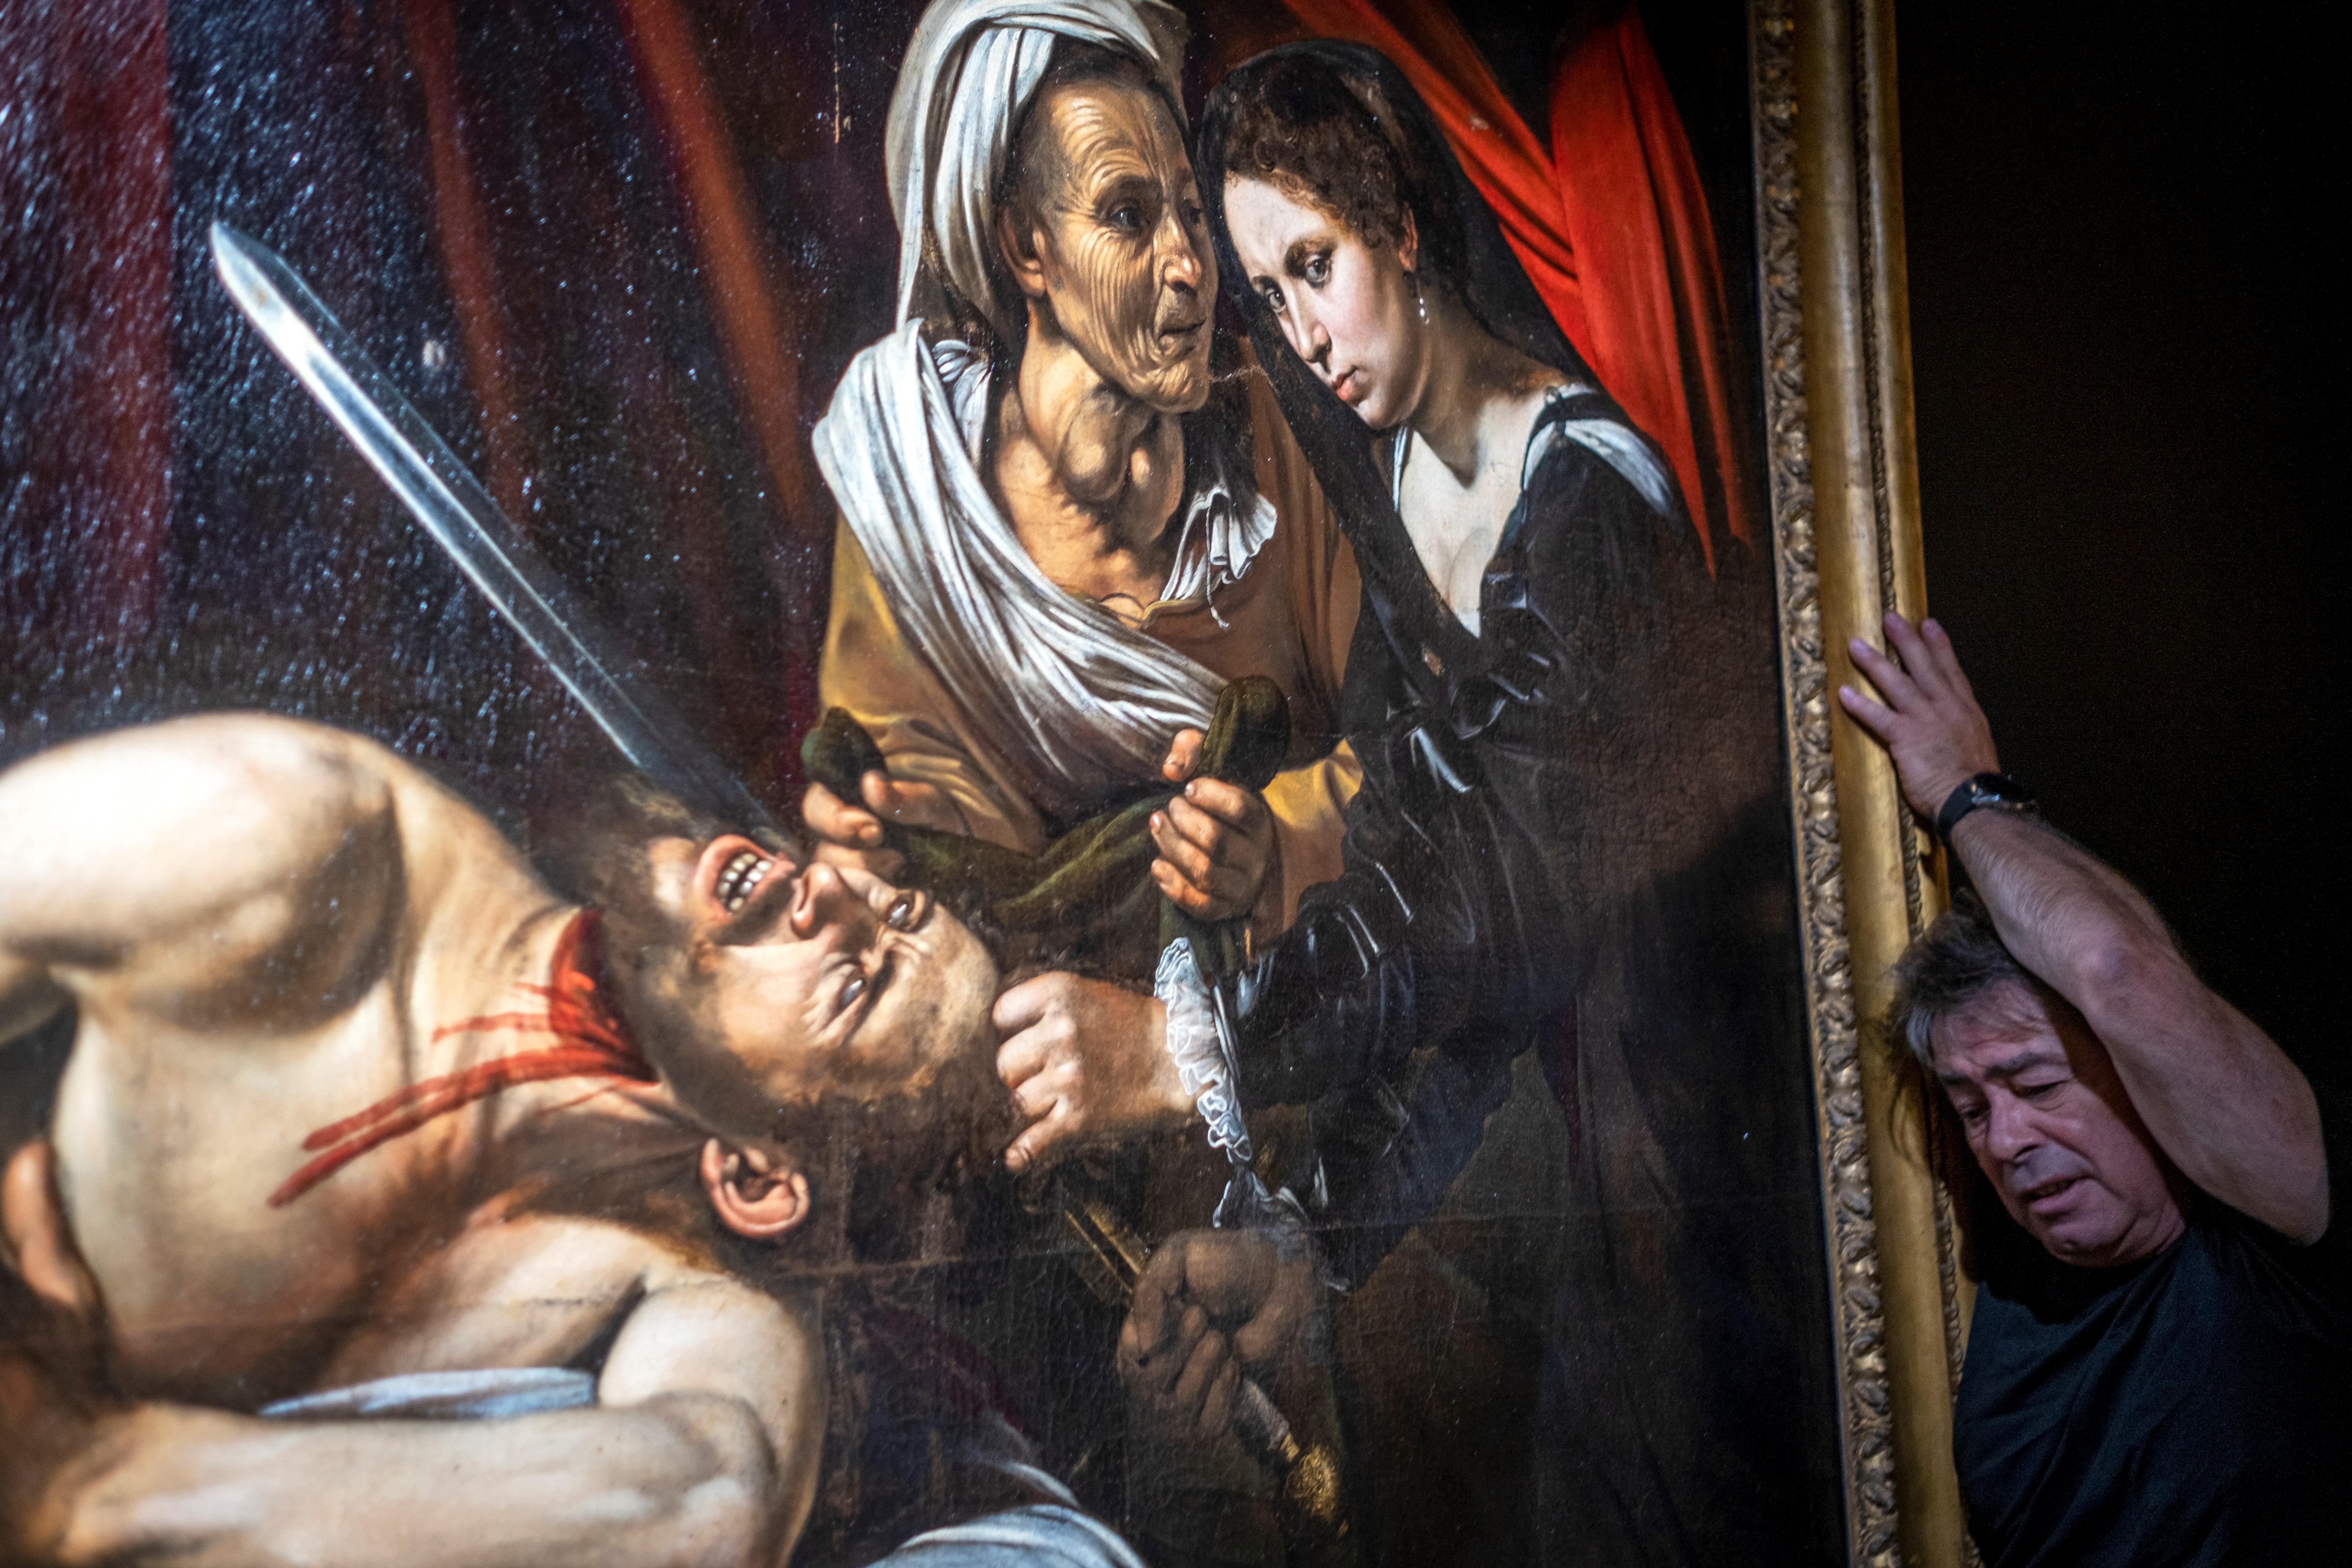 Elkelt a francia padláson megtalált Caravaggio-festmény